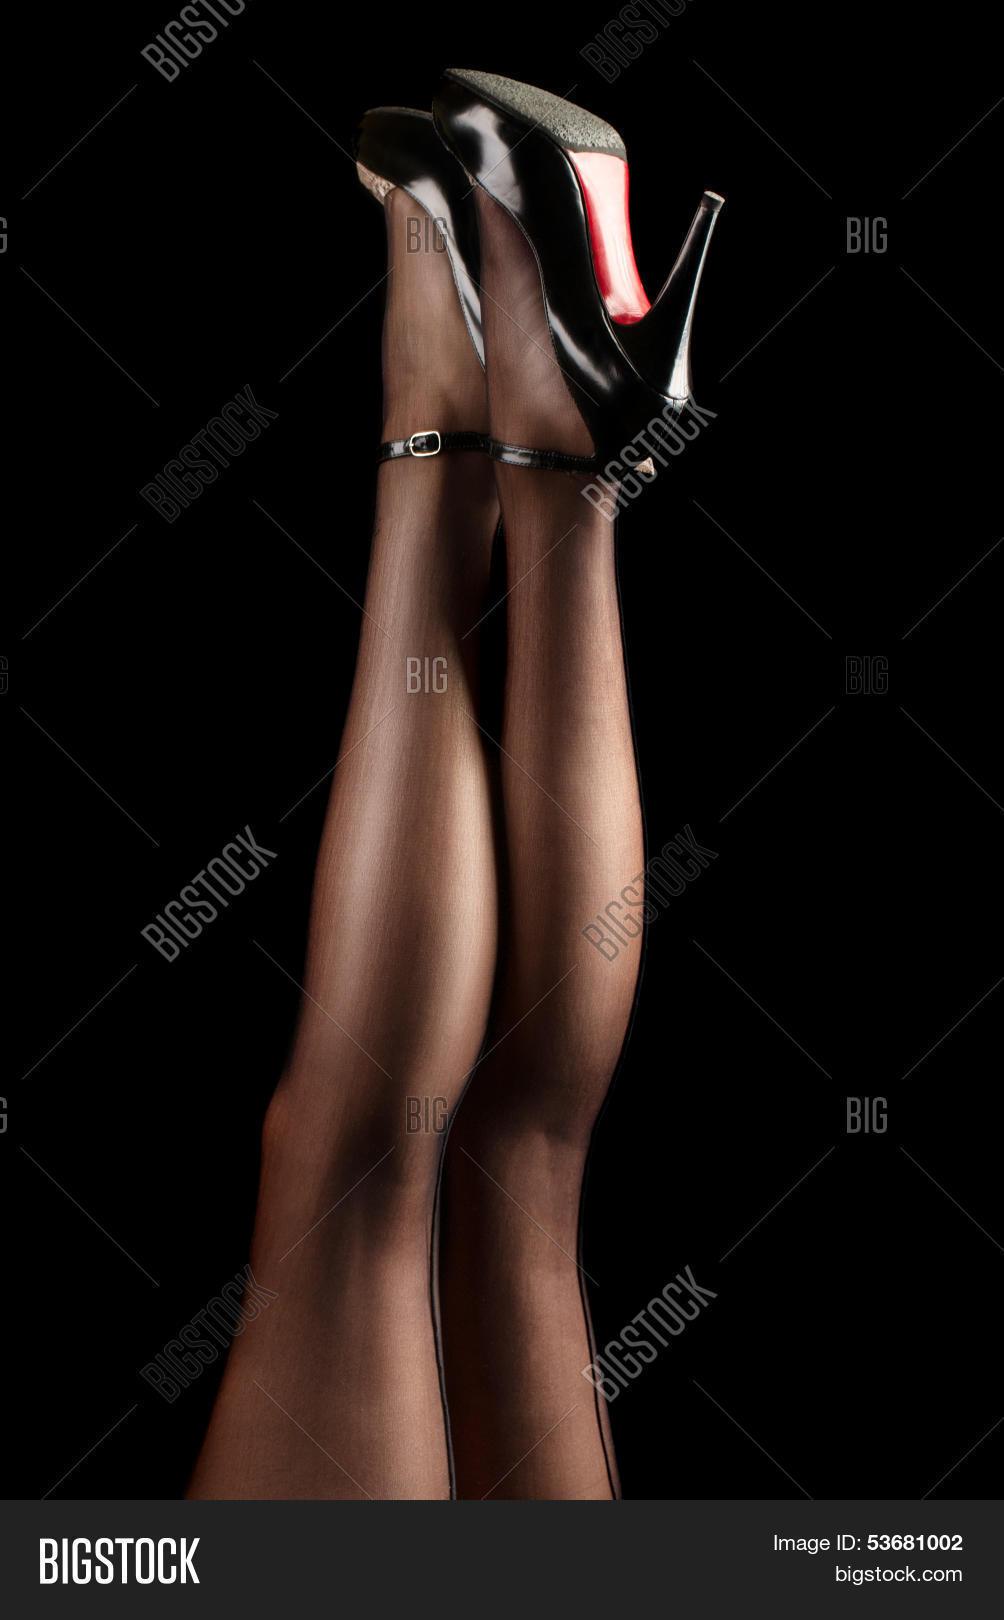 Hot Legs In Stockings